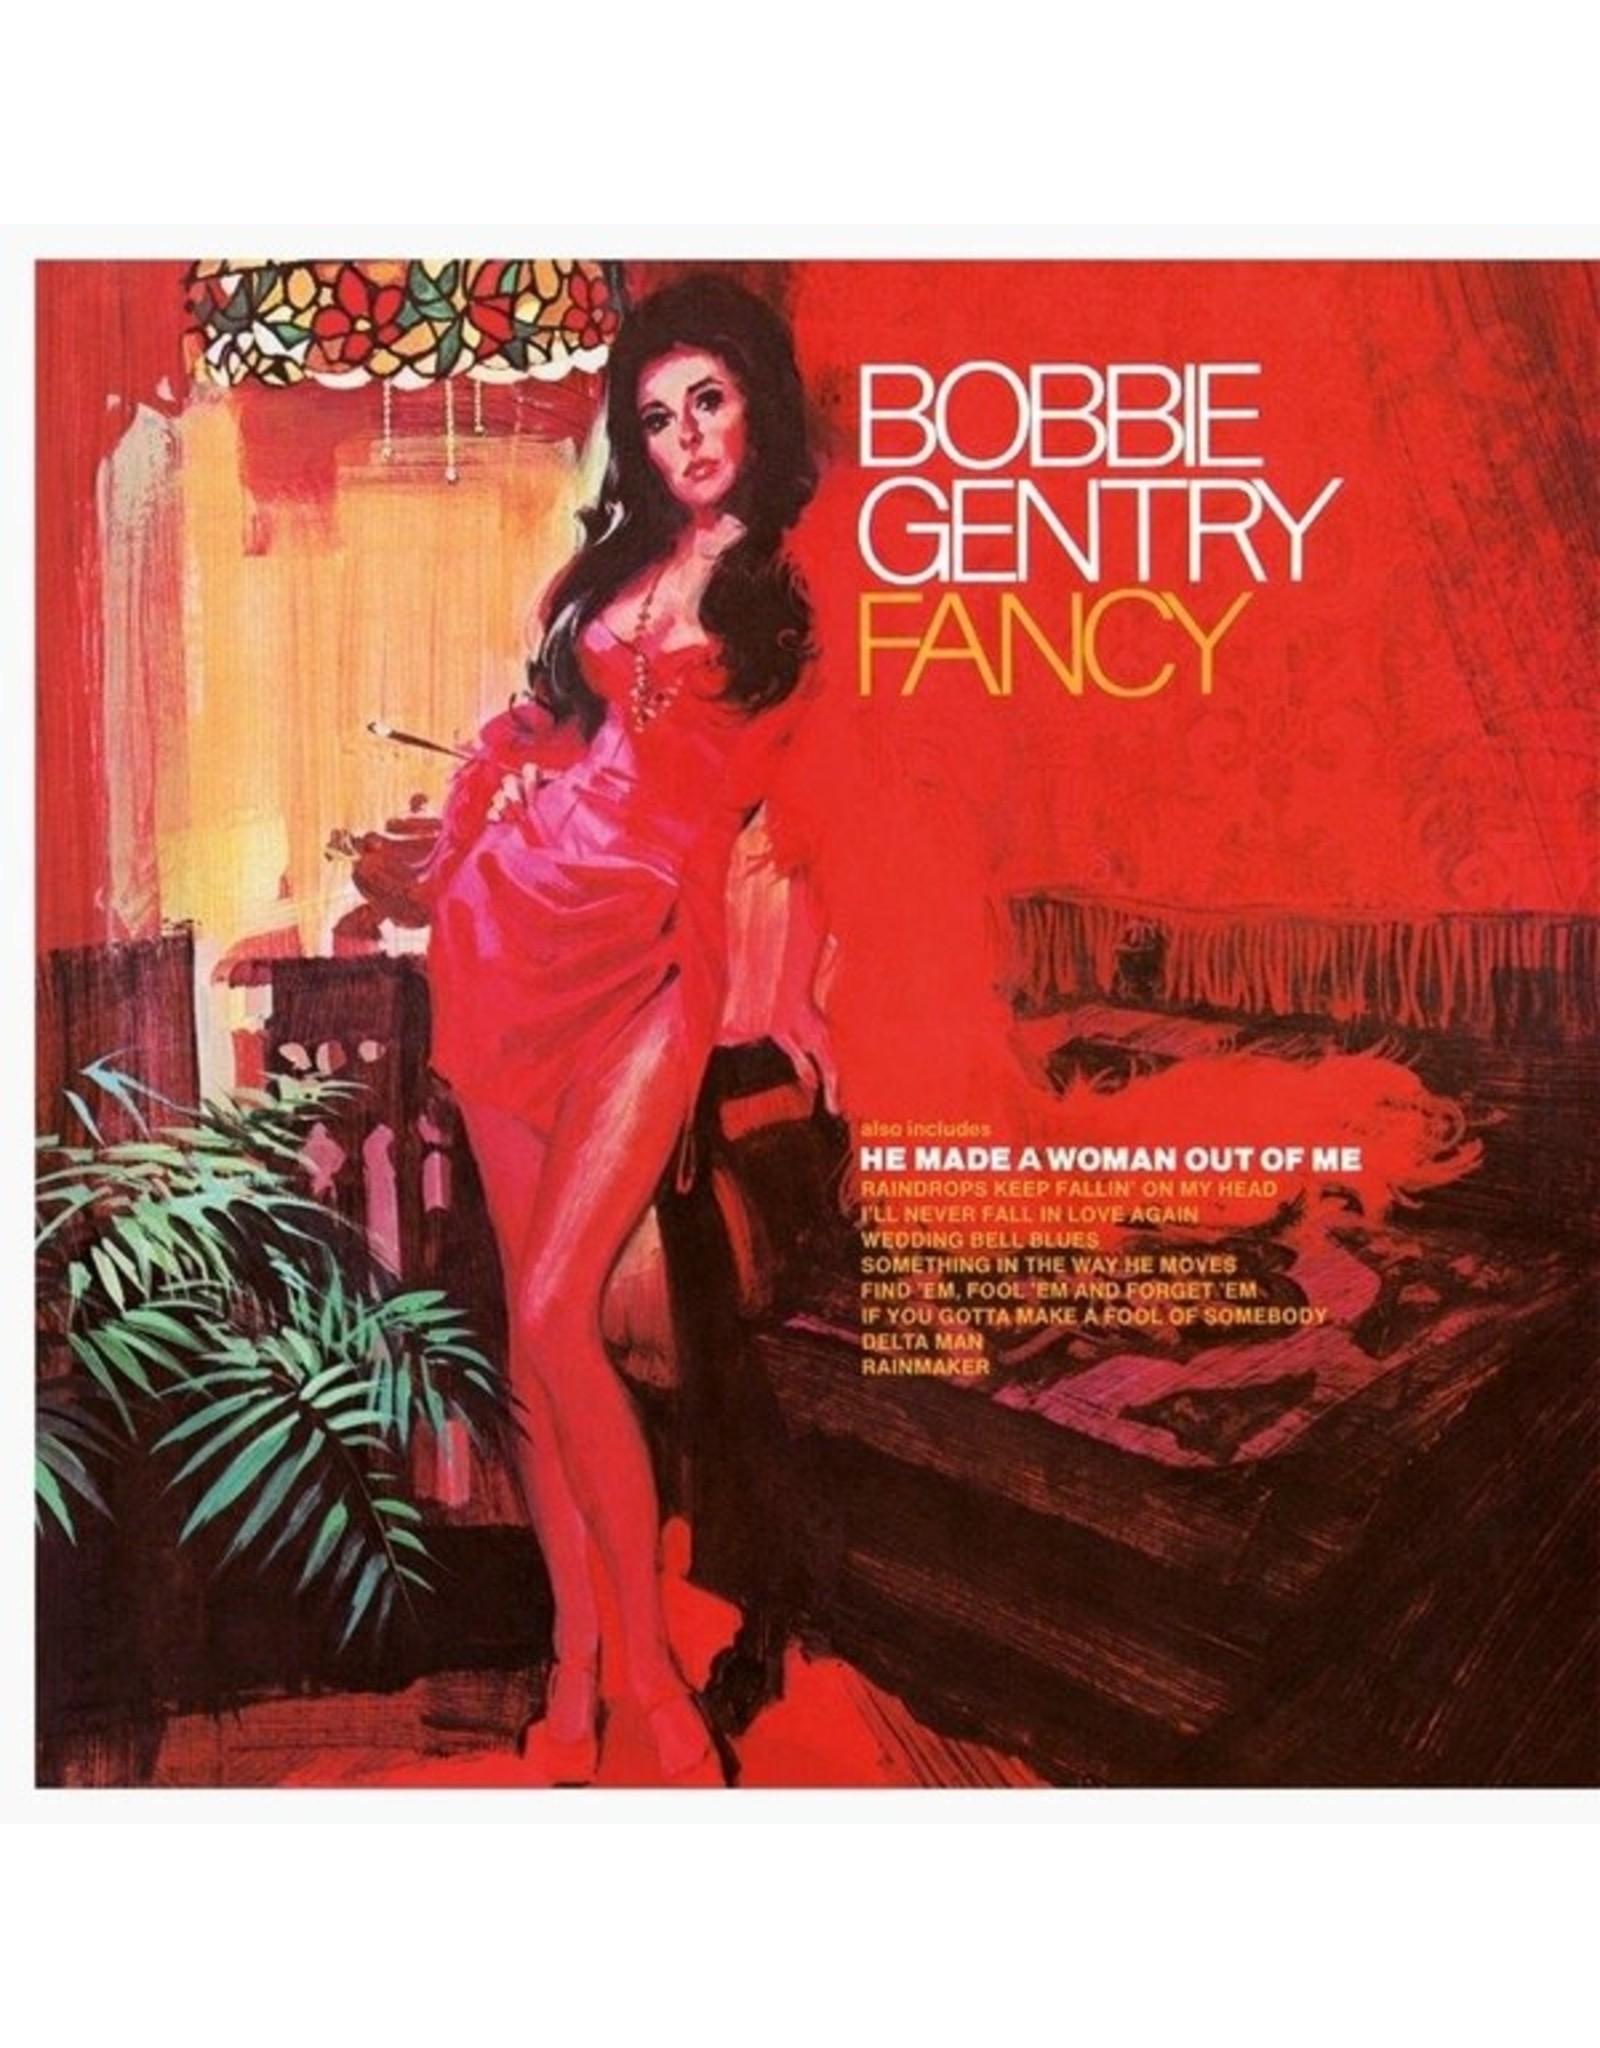 New Vinyl Bobbie Gentry - Fancy LP